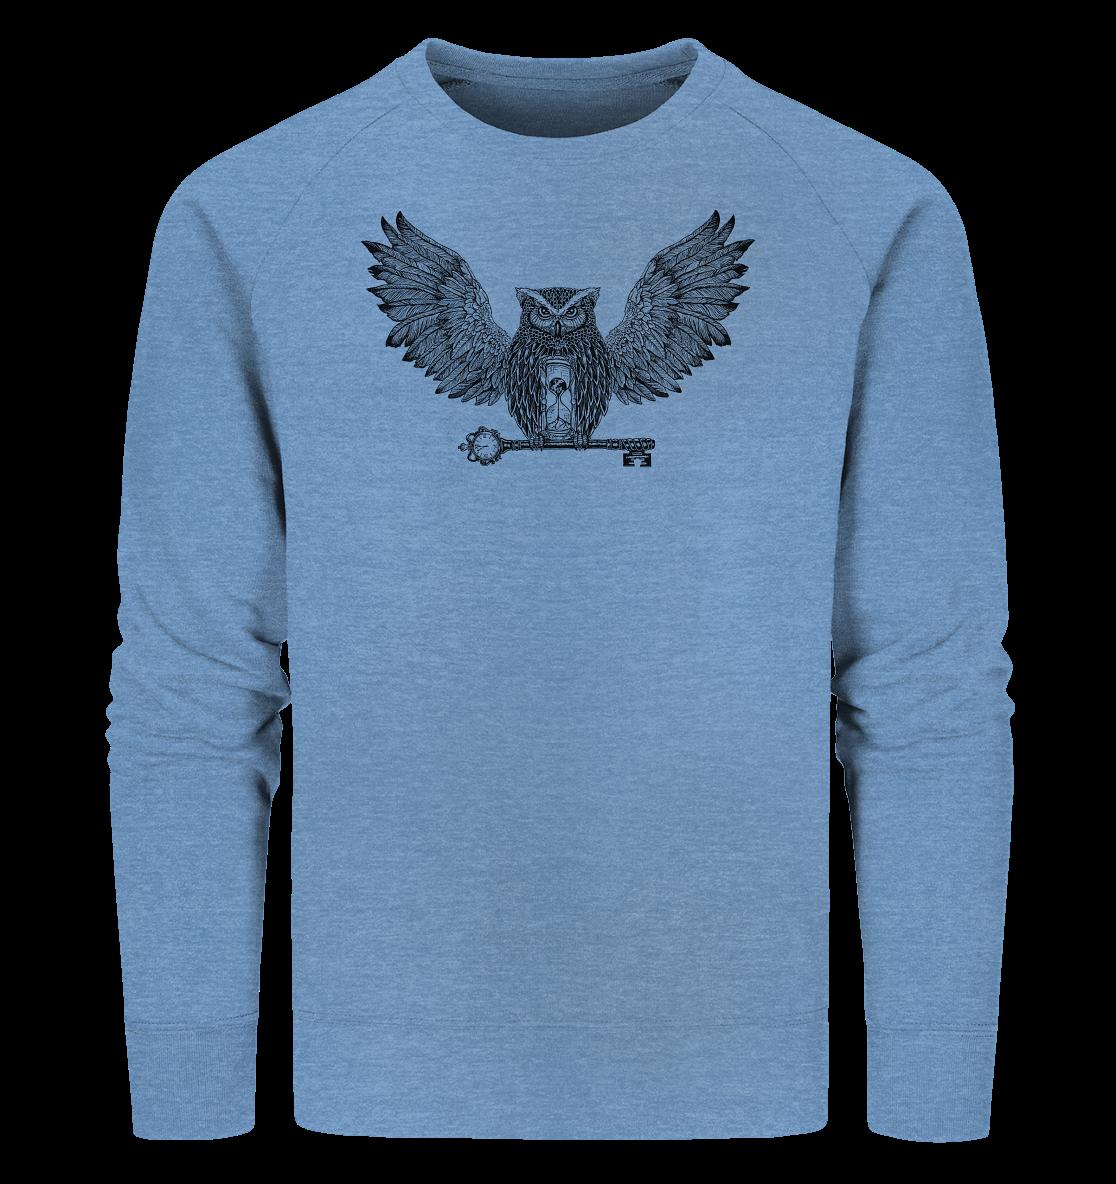 front-organic-sweatshirt-6090c4-1116x-5.png